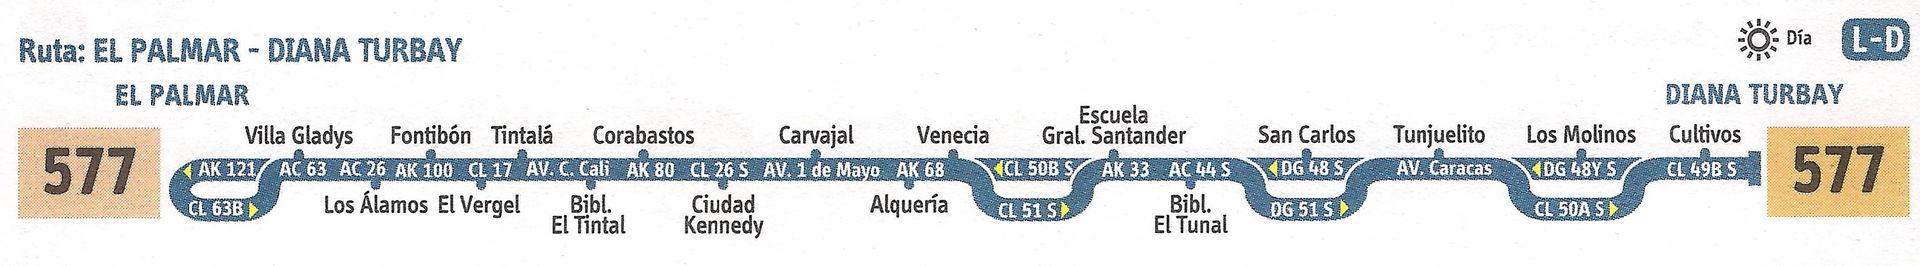 Ruta SITP: 577 El Palmar ↔ Diana Turbay [Urbana] 3